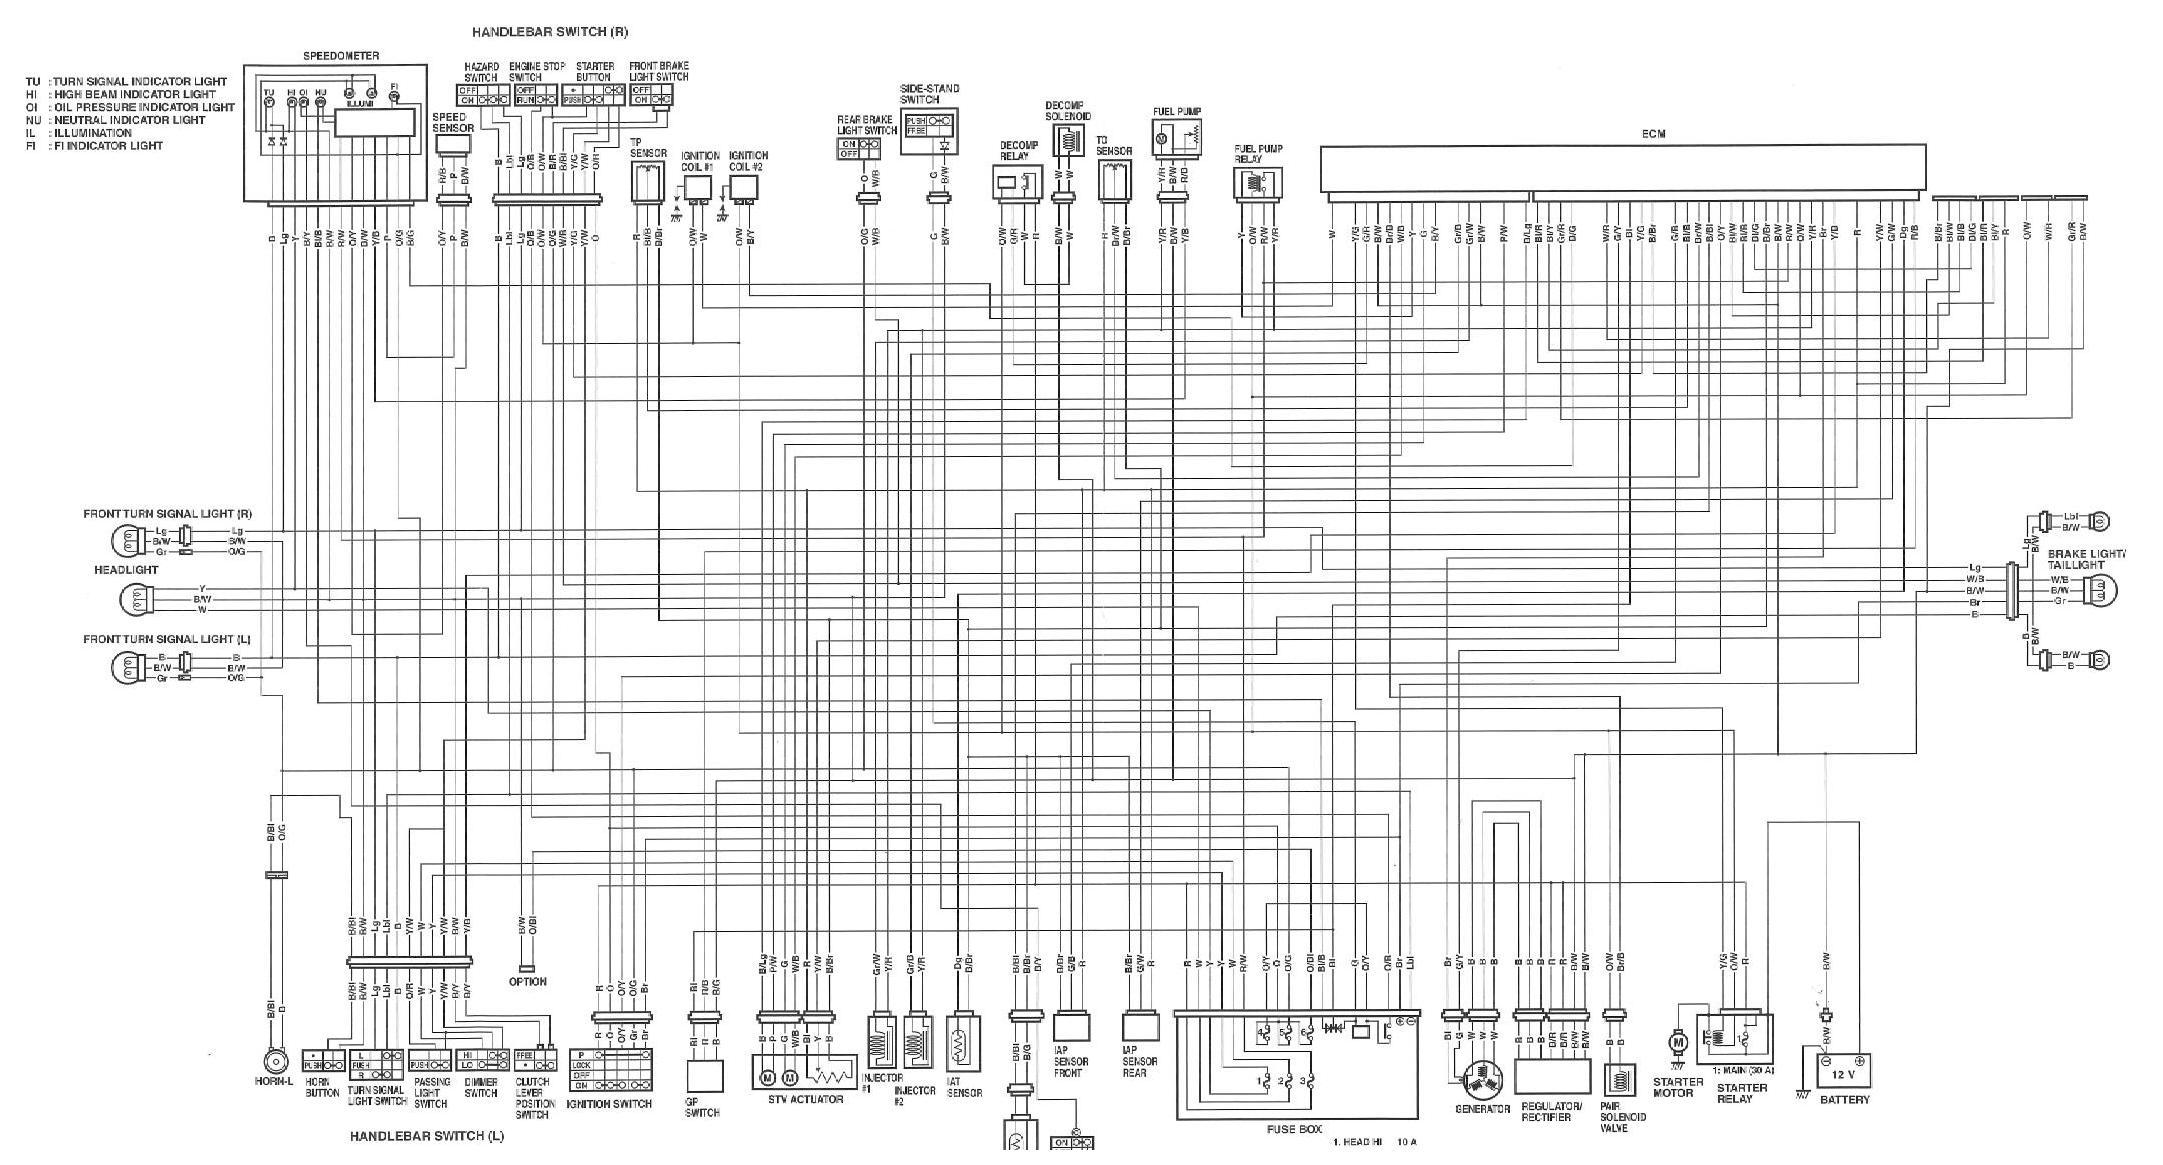 medium resolution of vl800 suzuki motorcycle wiring diagrams electrical wiring diagram suzuki vl800 wiring diagram suzuki